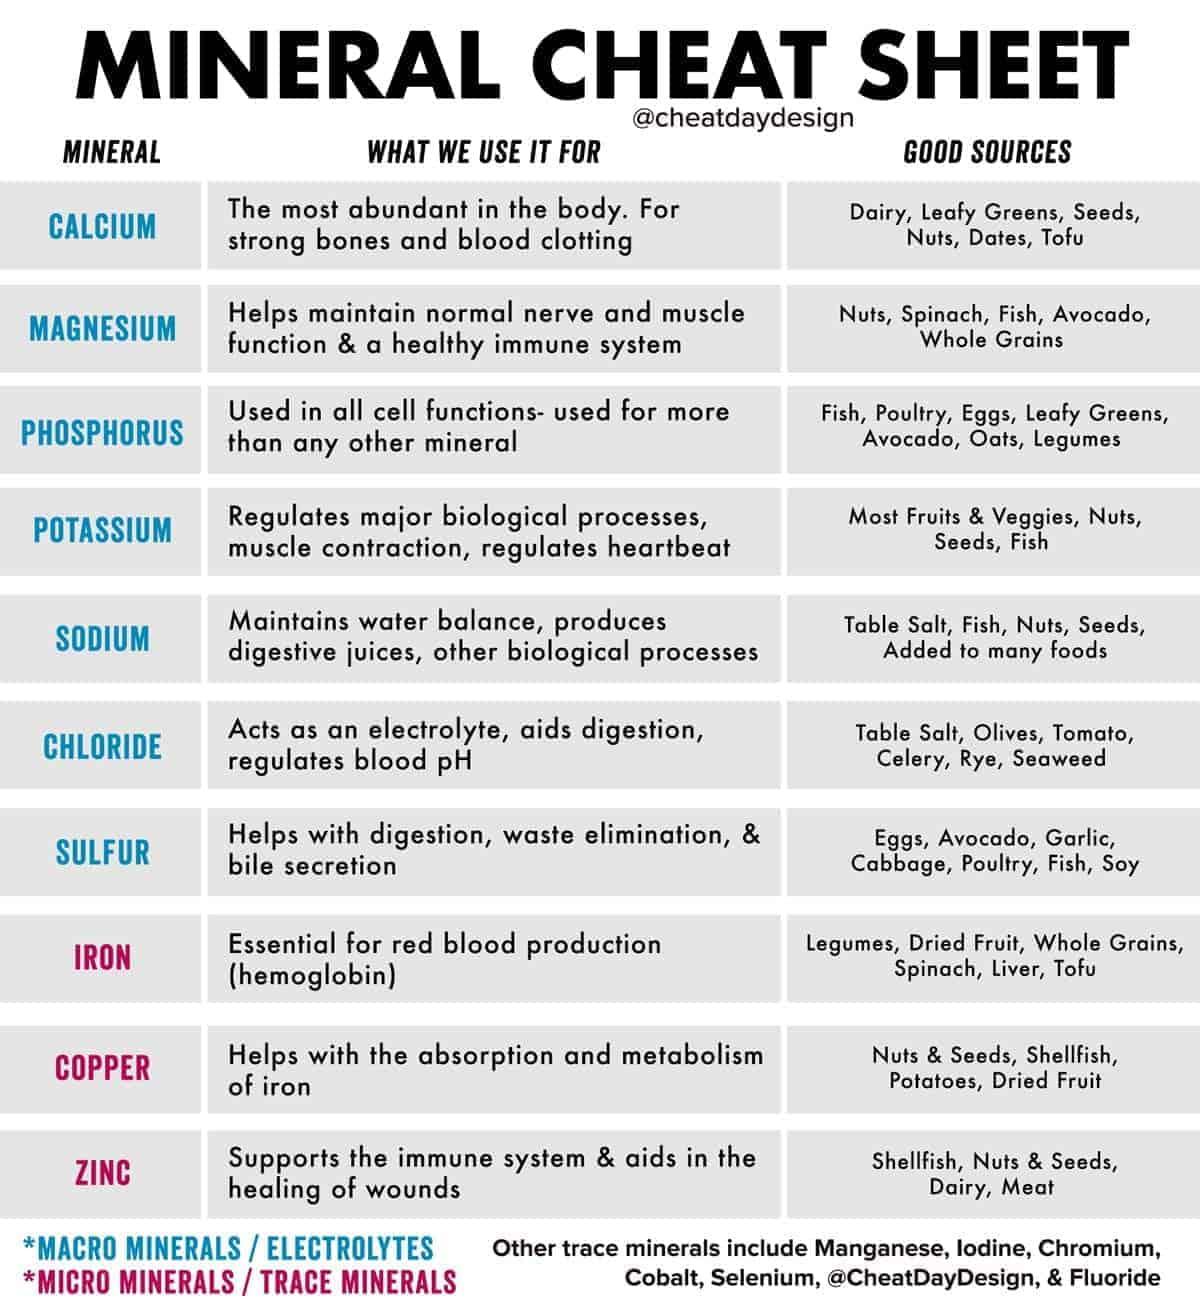 Minerals Cheat Sheet